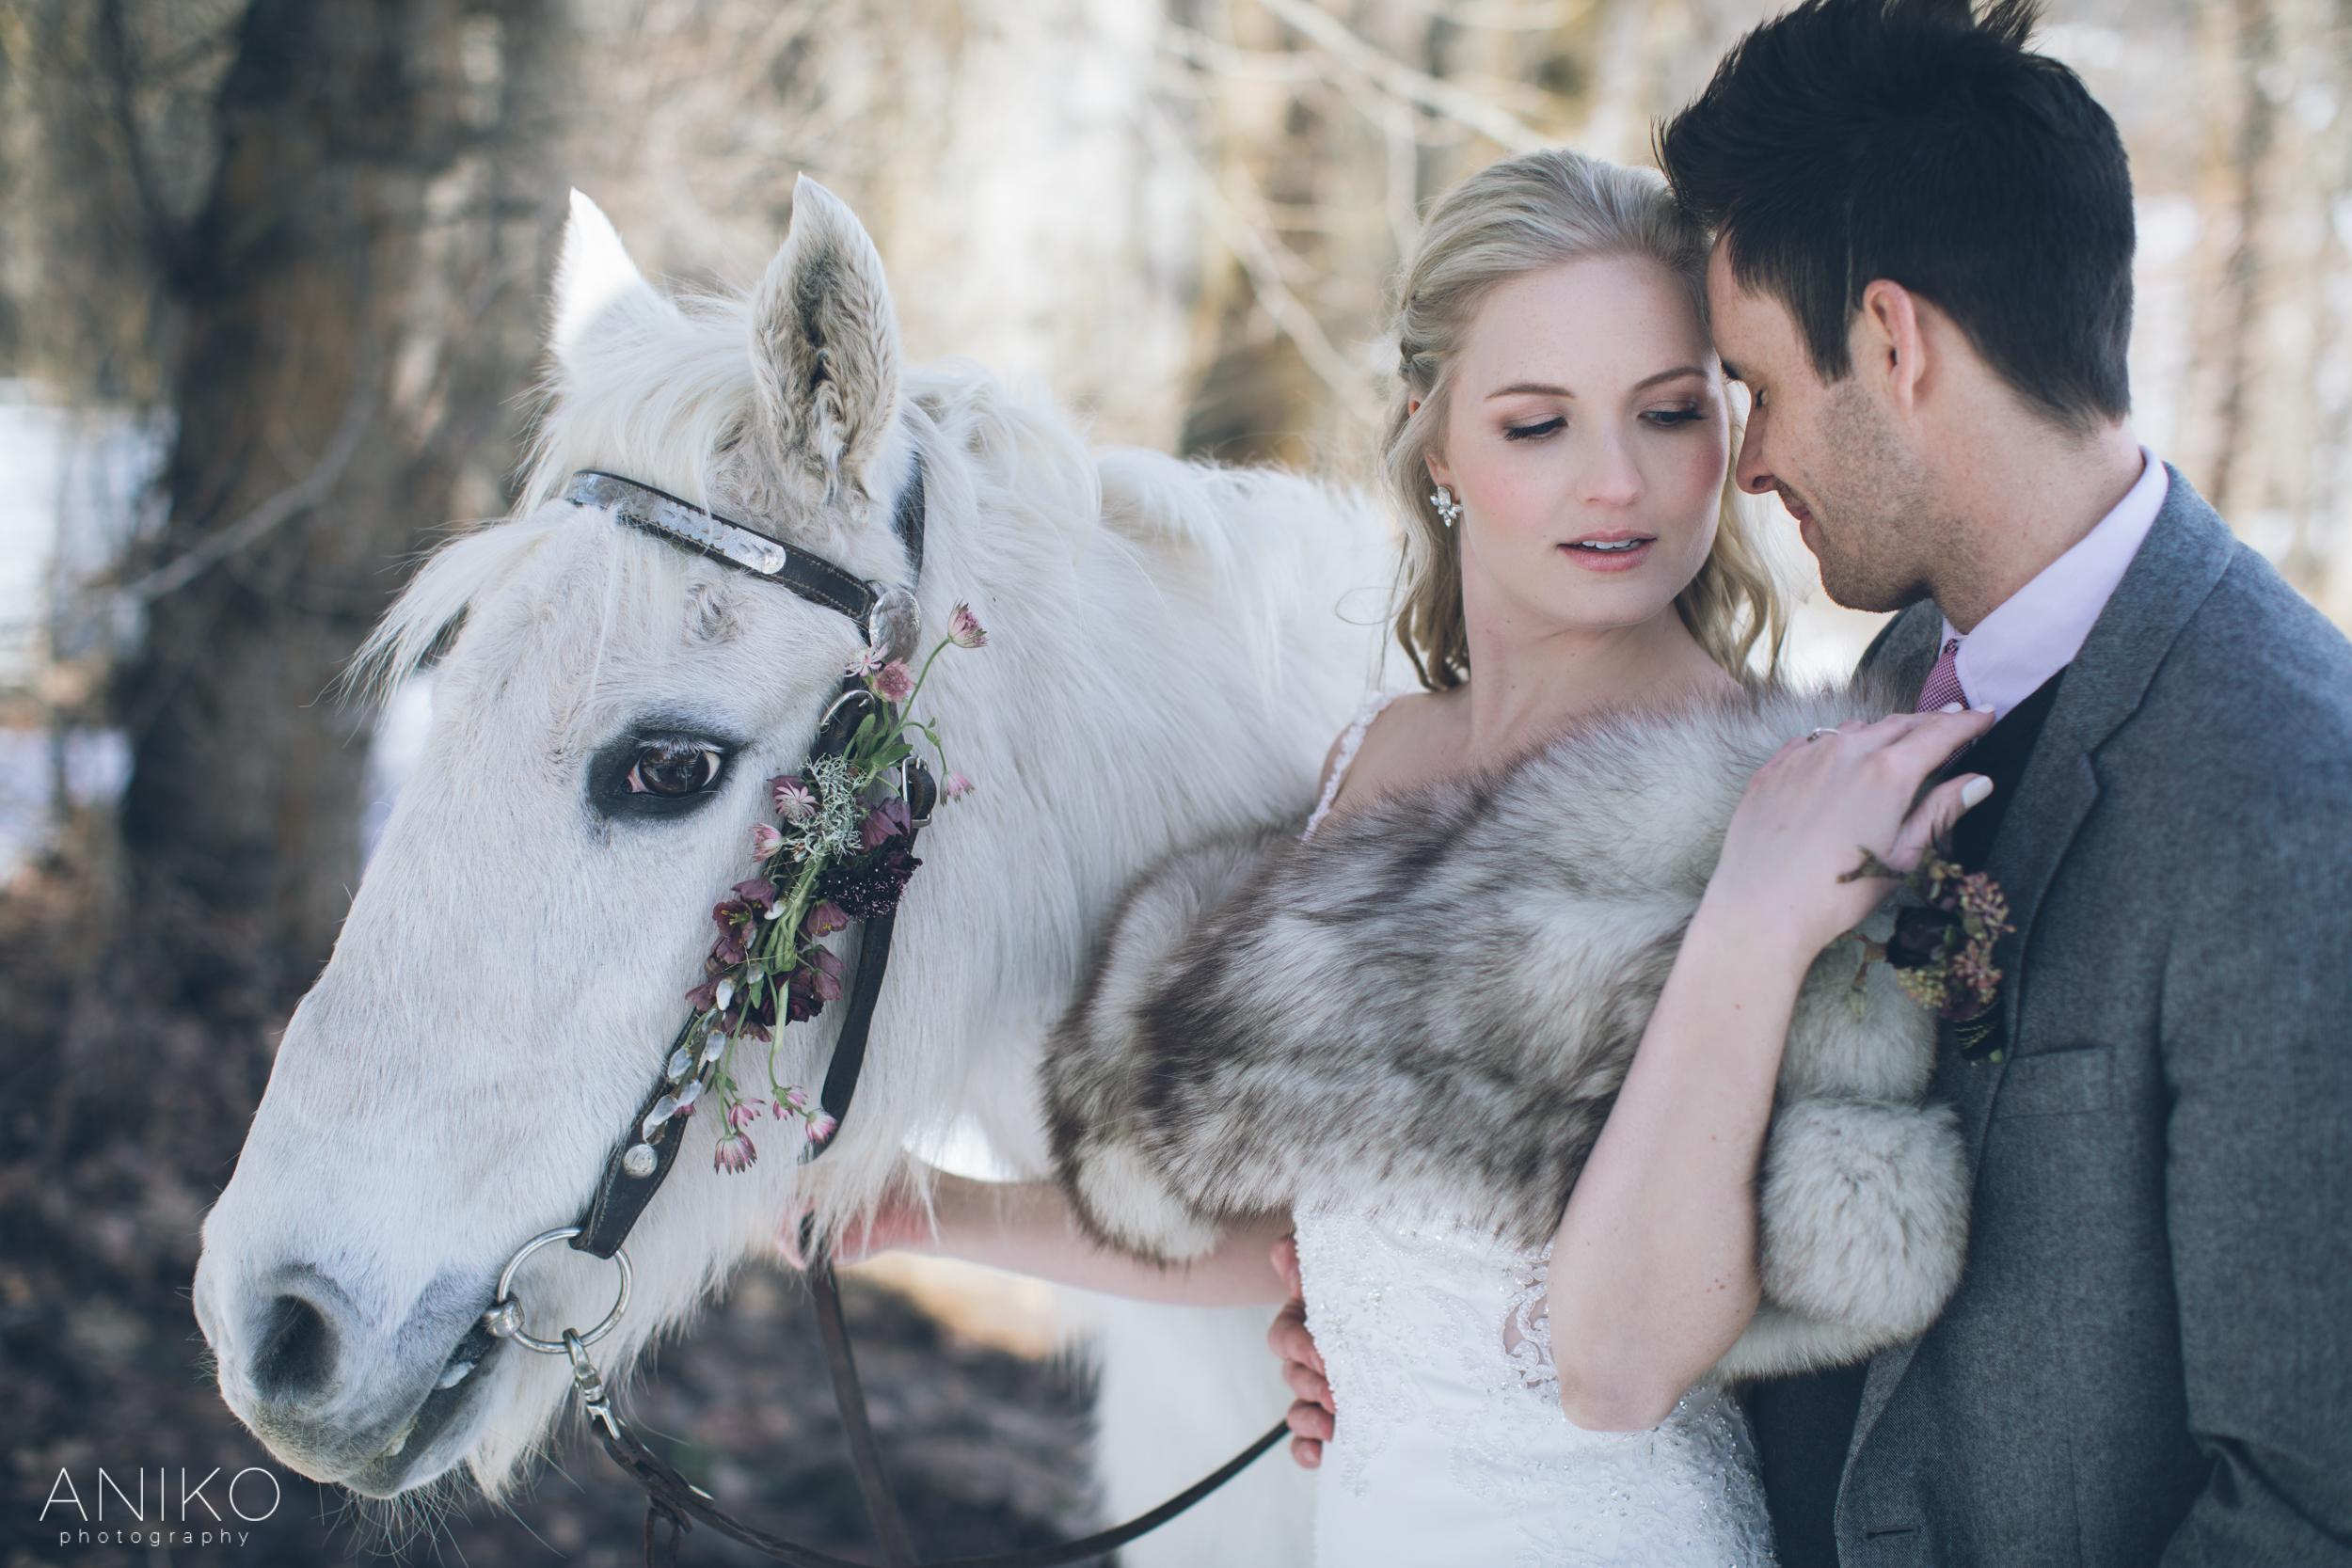 aniko-photography-portland-wedding-photographers-141.jpg